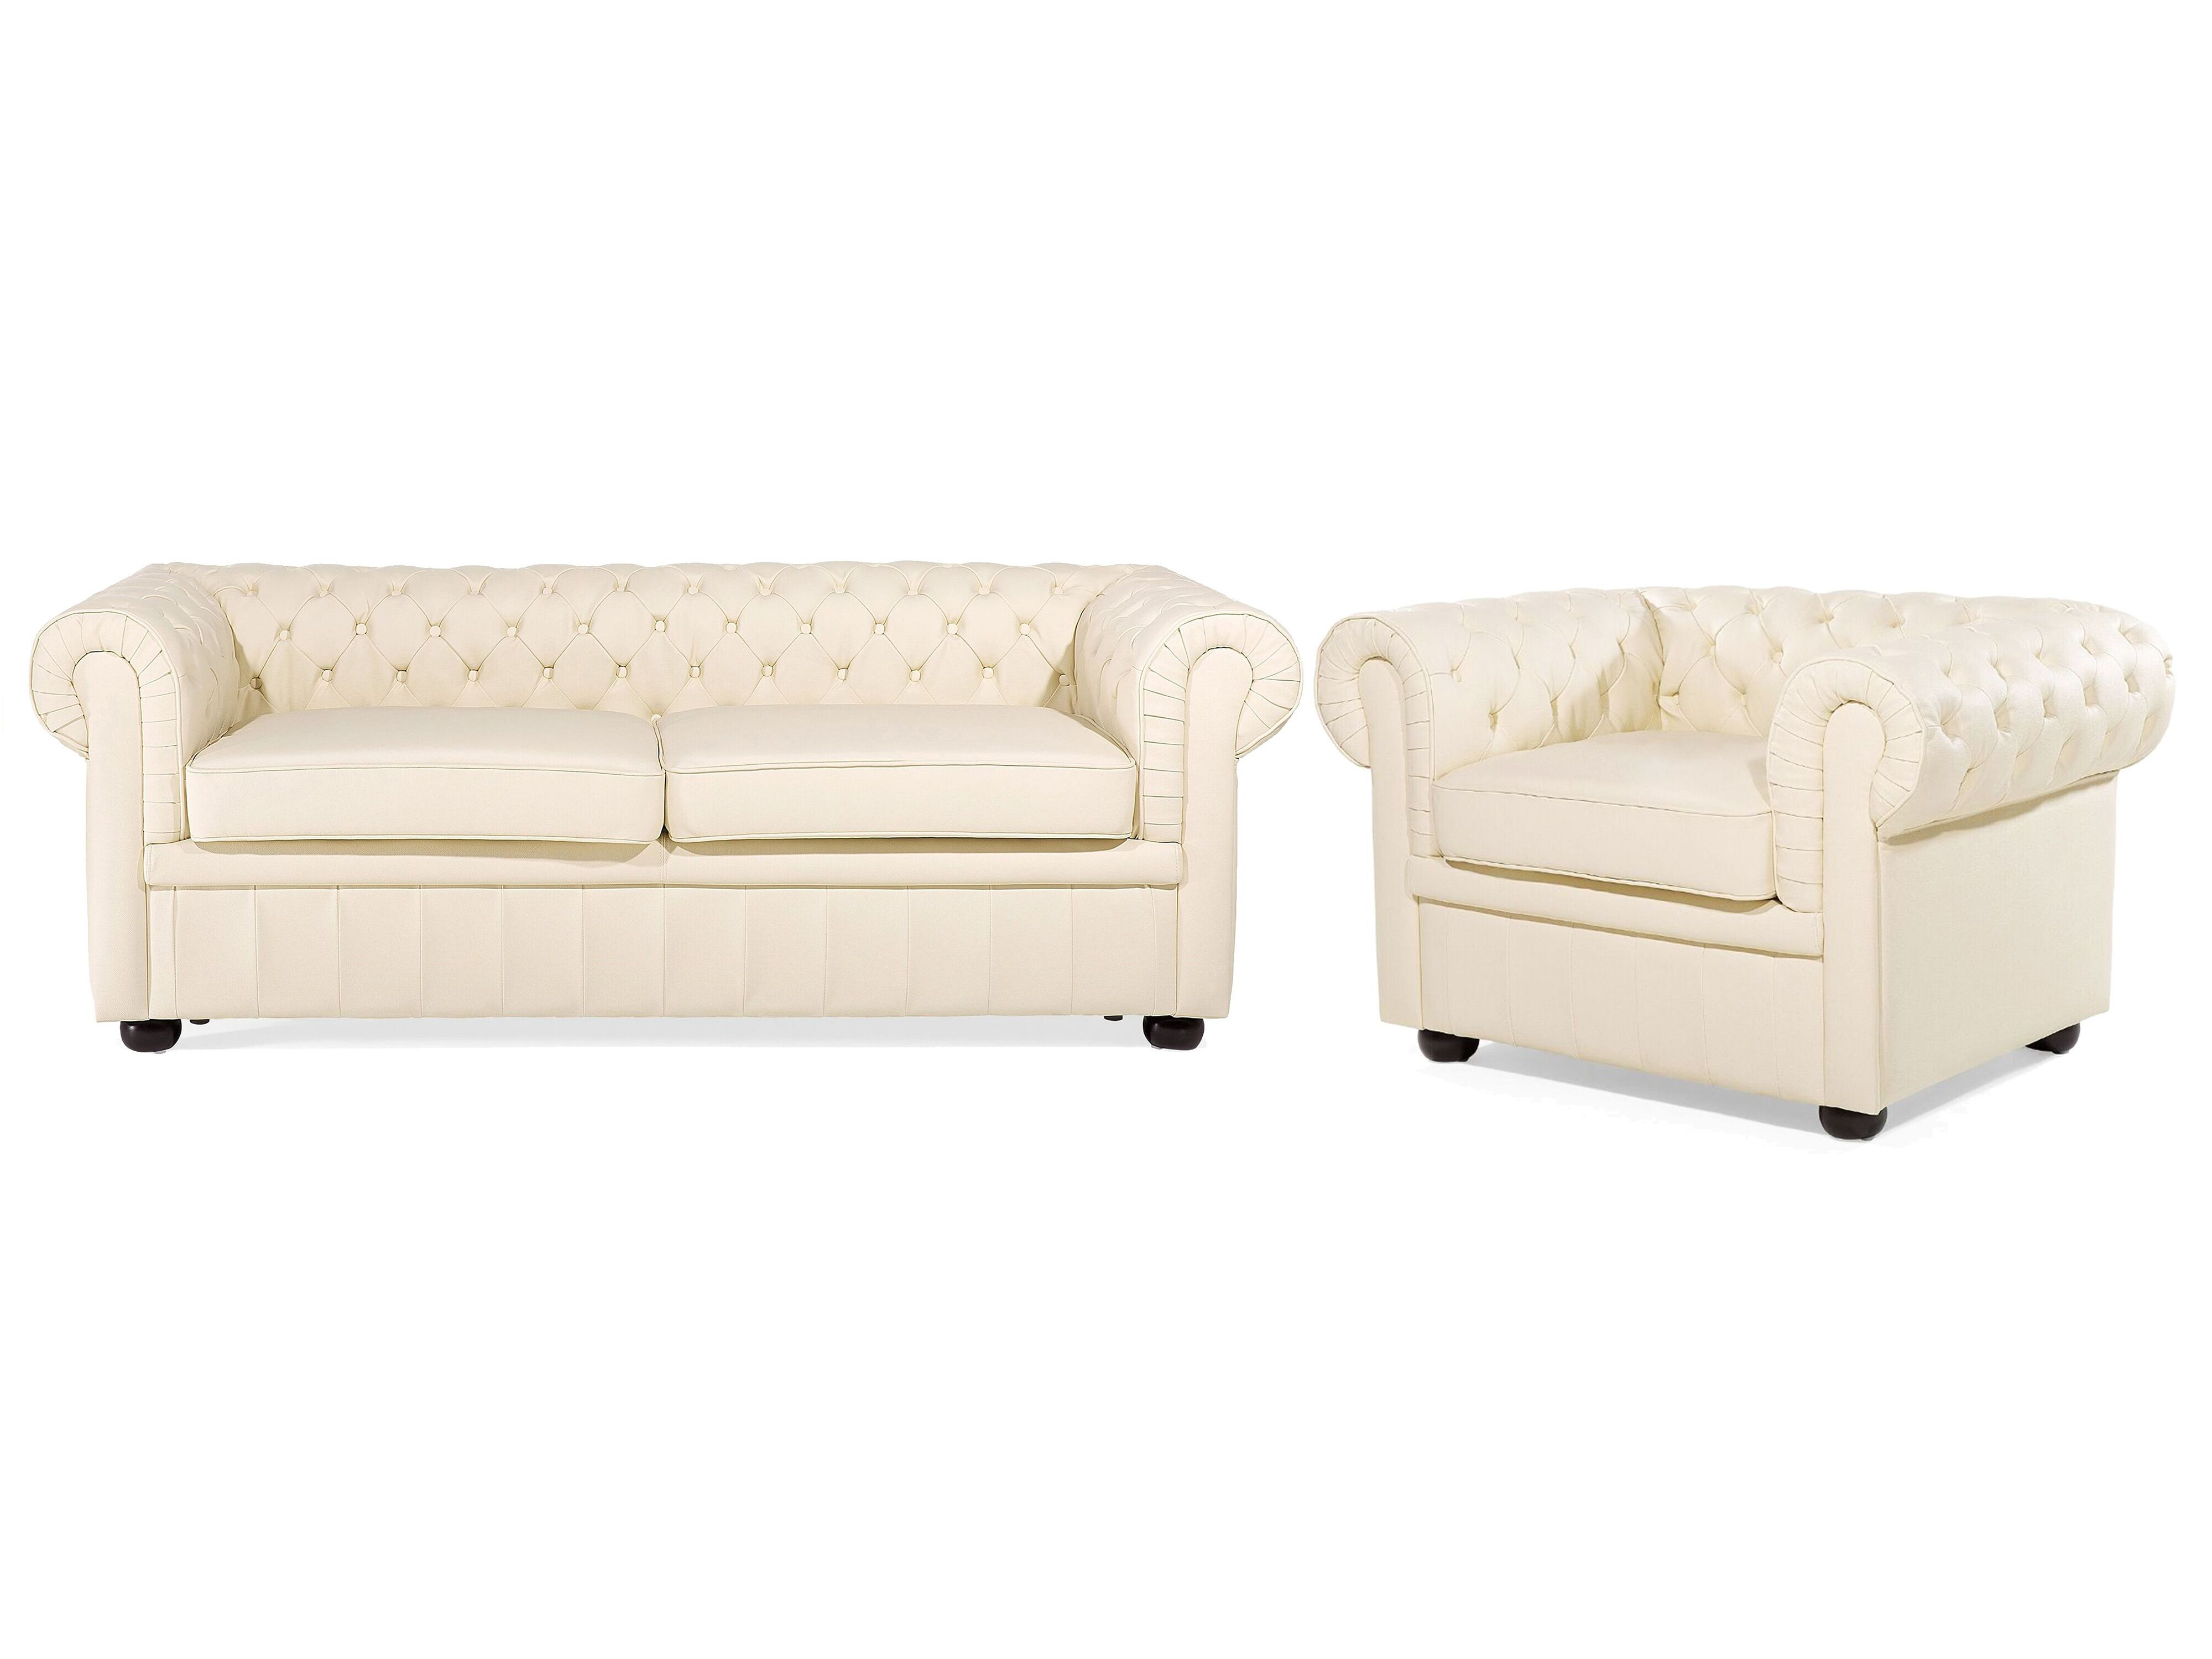 Kennedy 2 5 Zits 2 Zits Bank Seats And Sofas